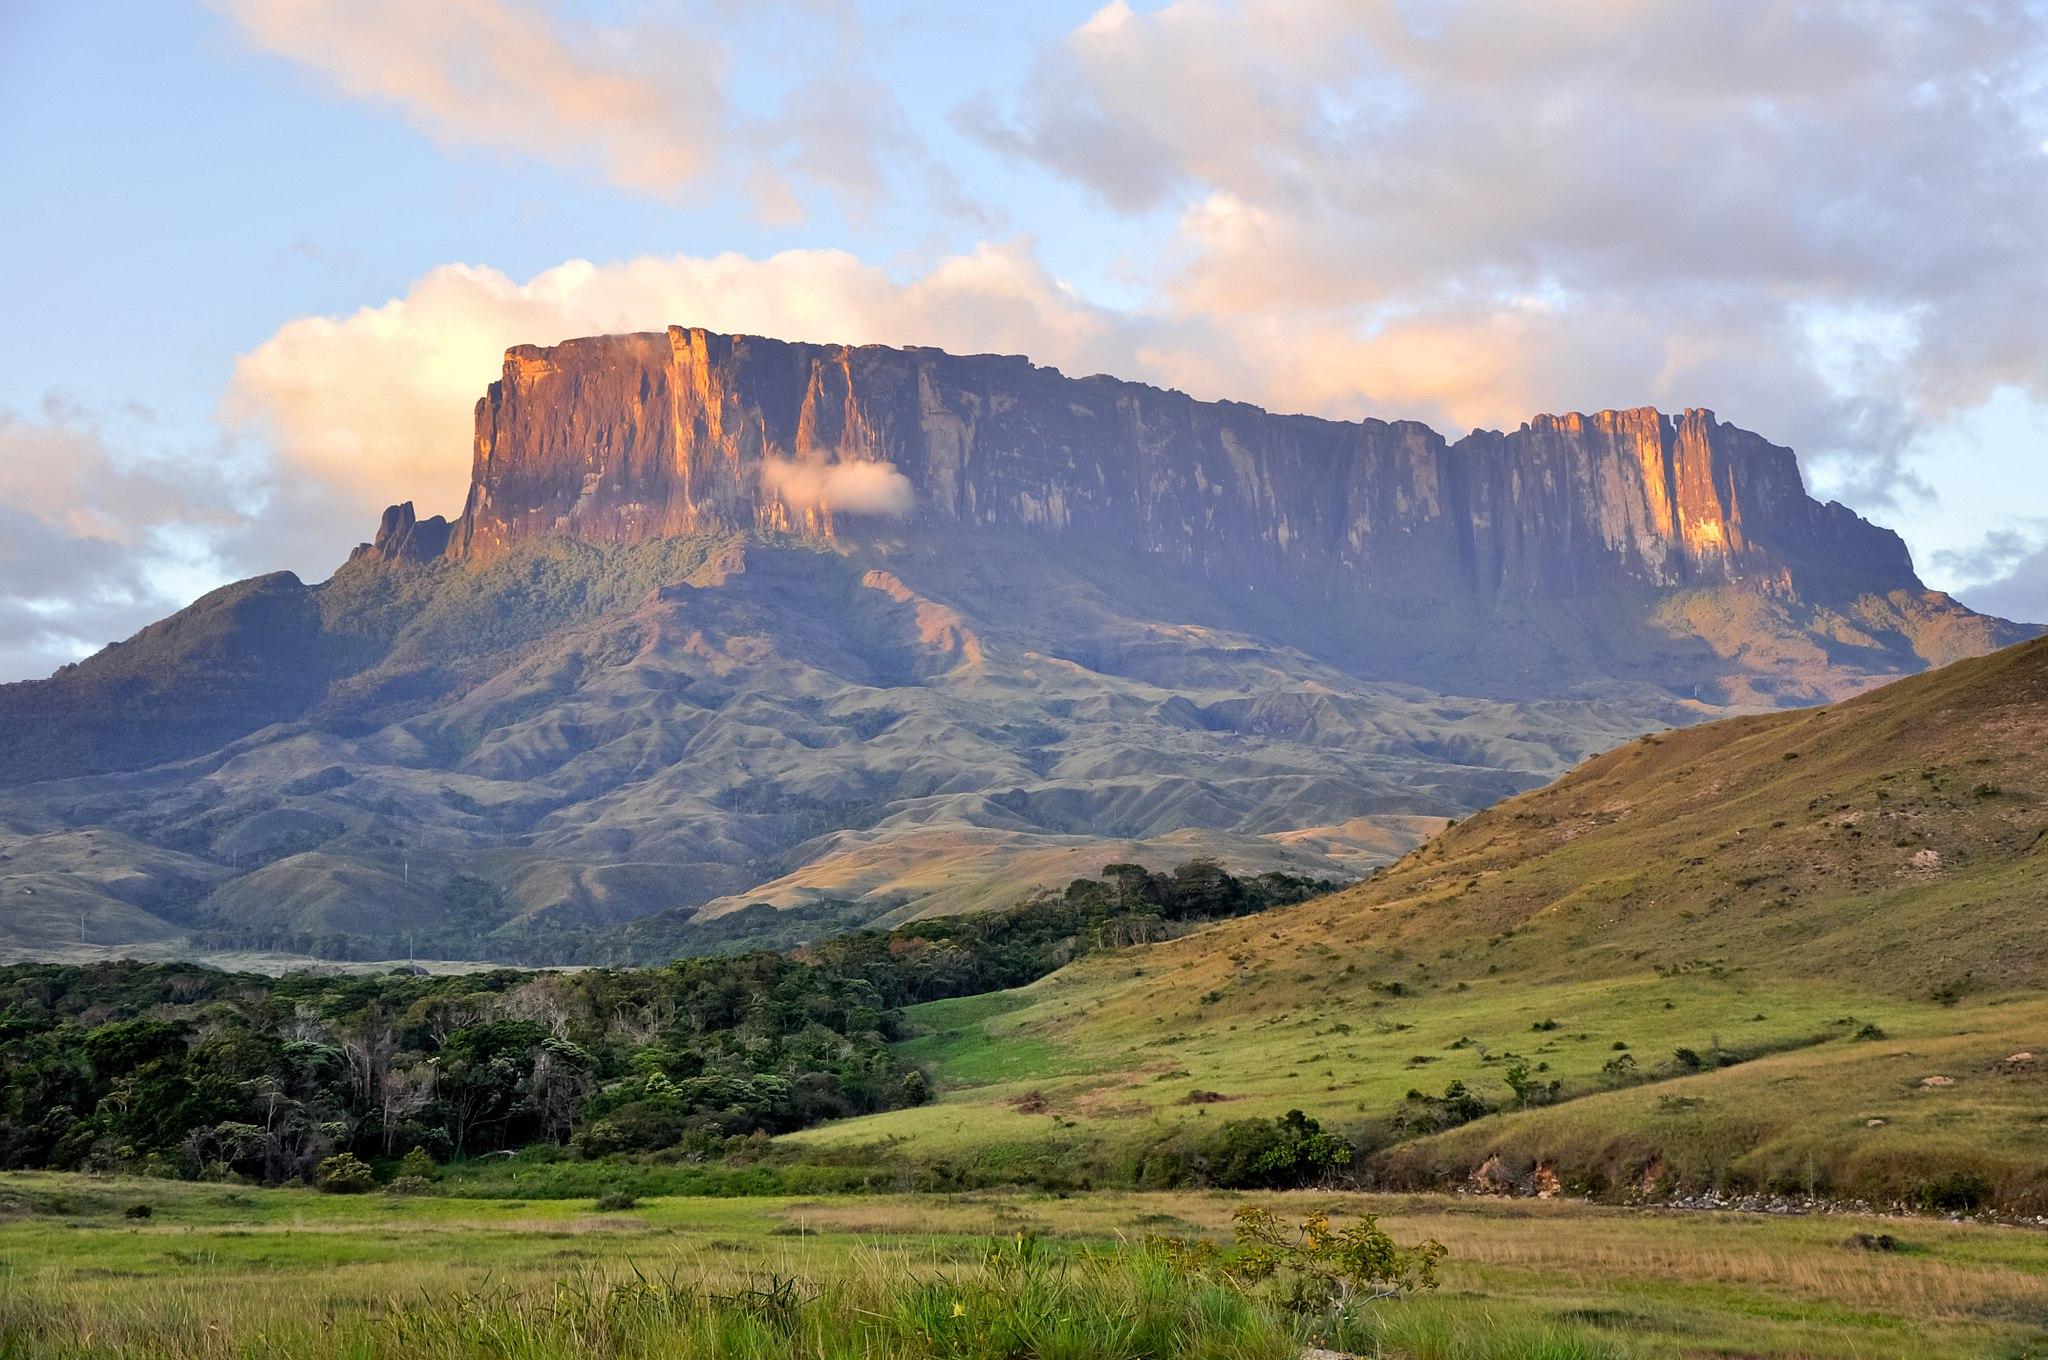 Tepui rock formation in Gran Sabana National Park, Venezuela